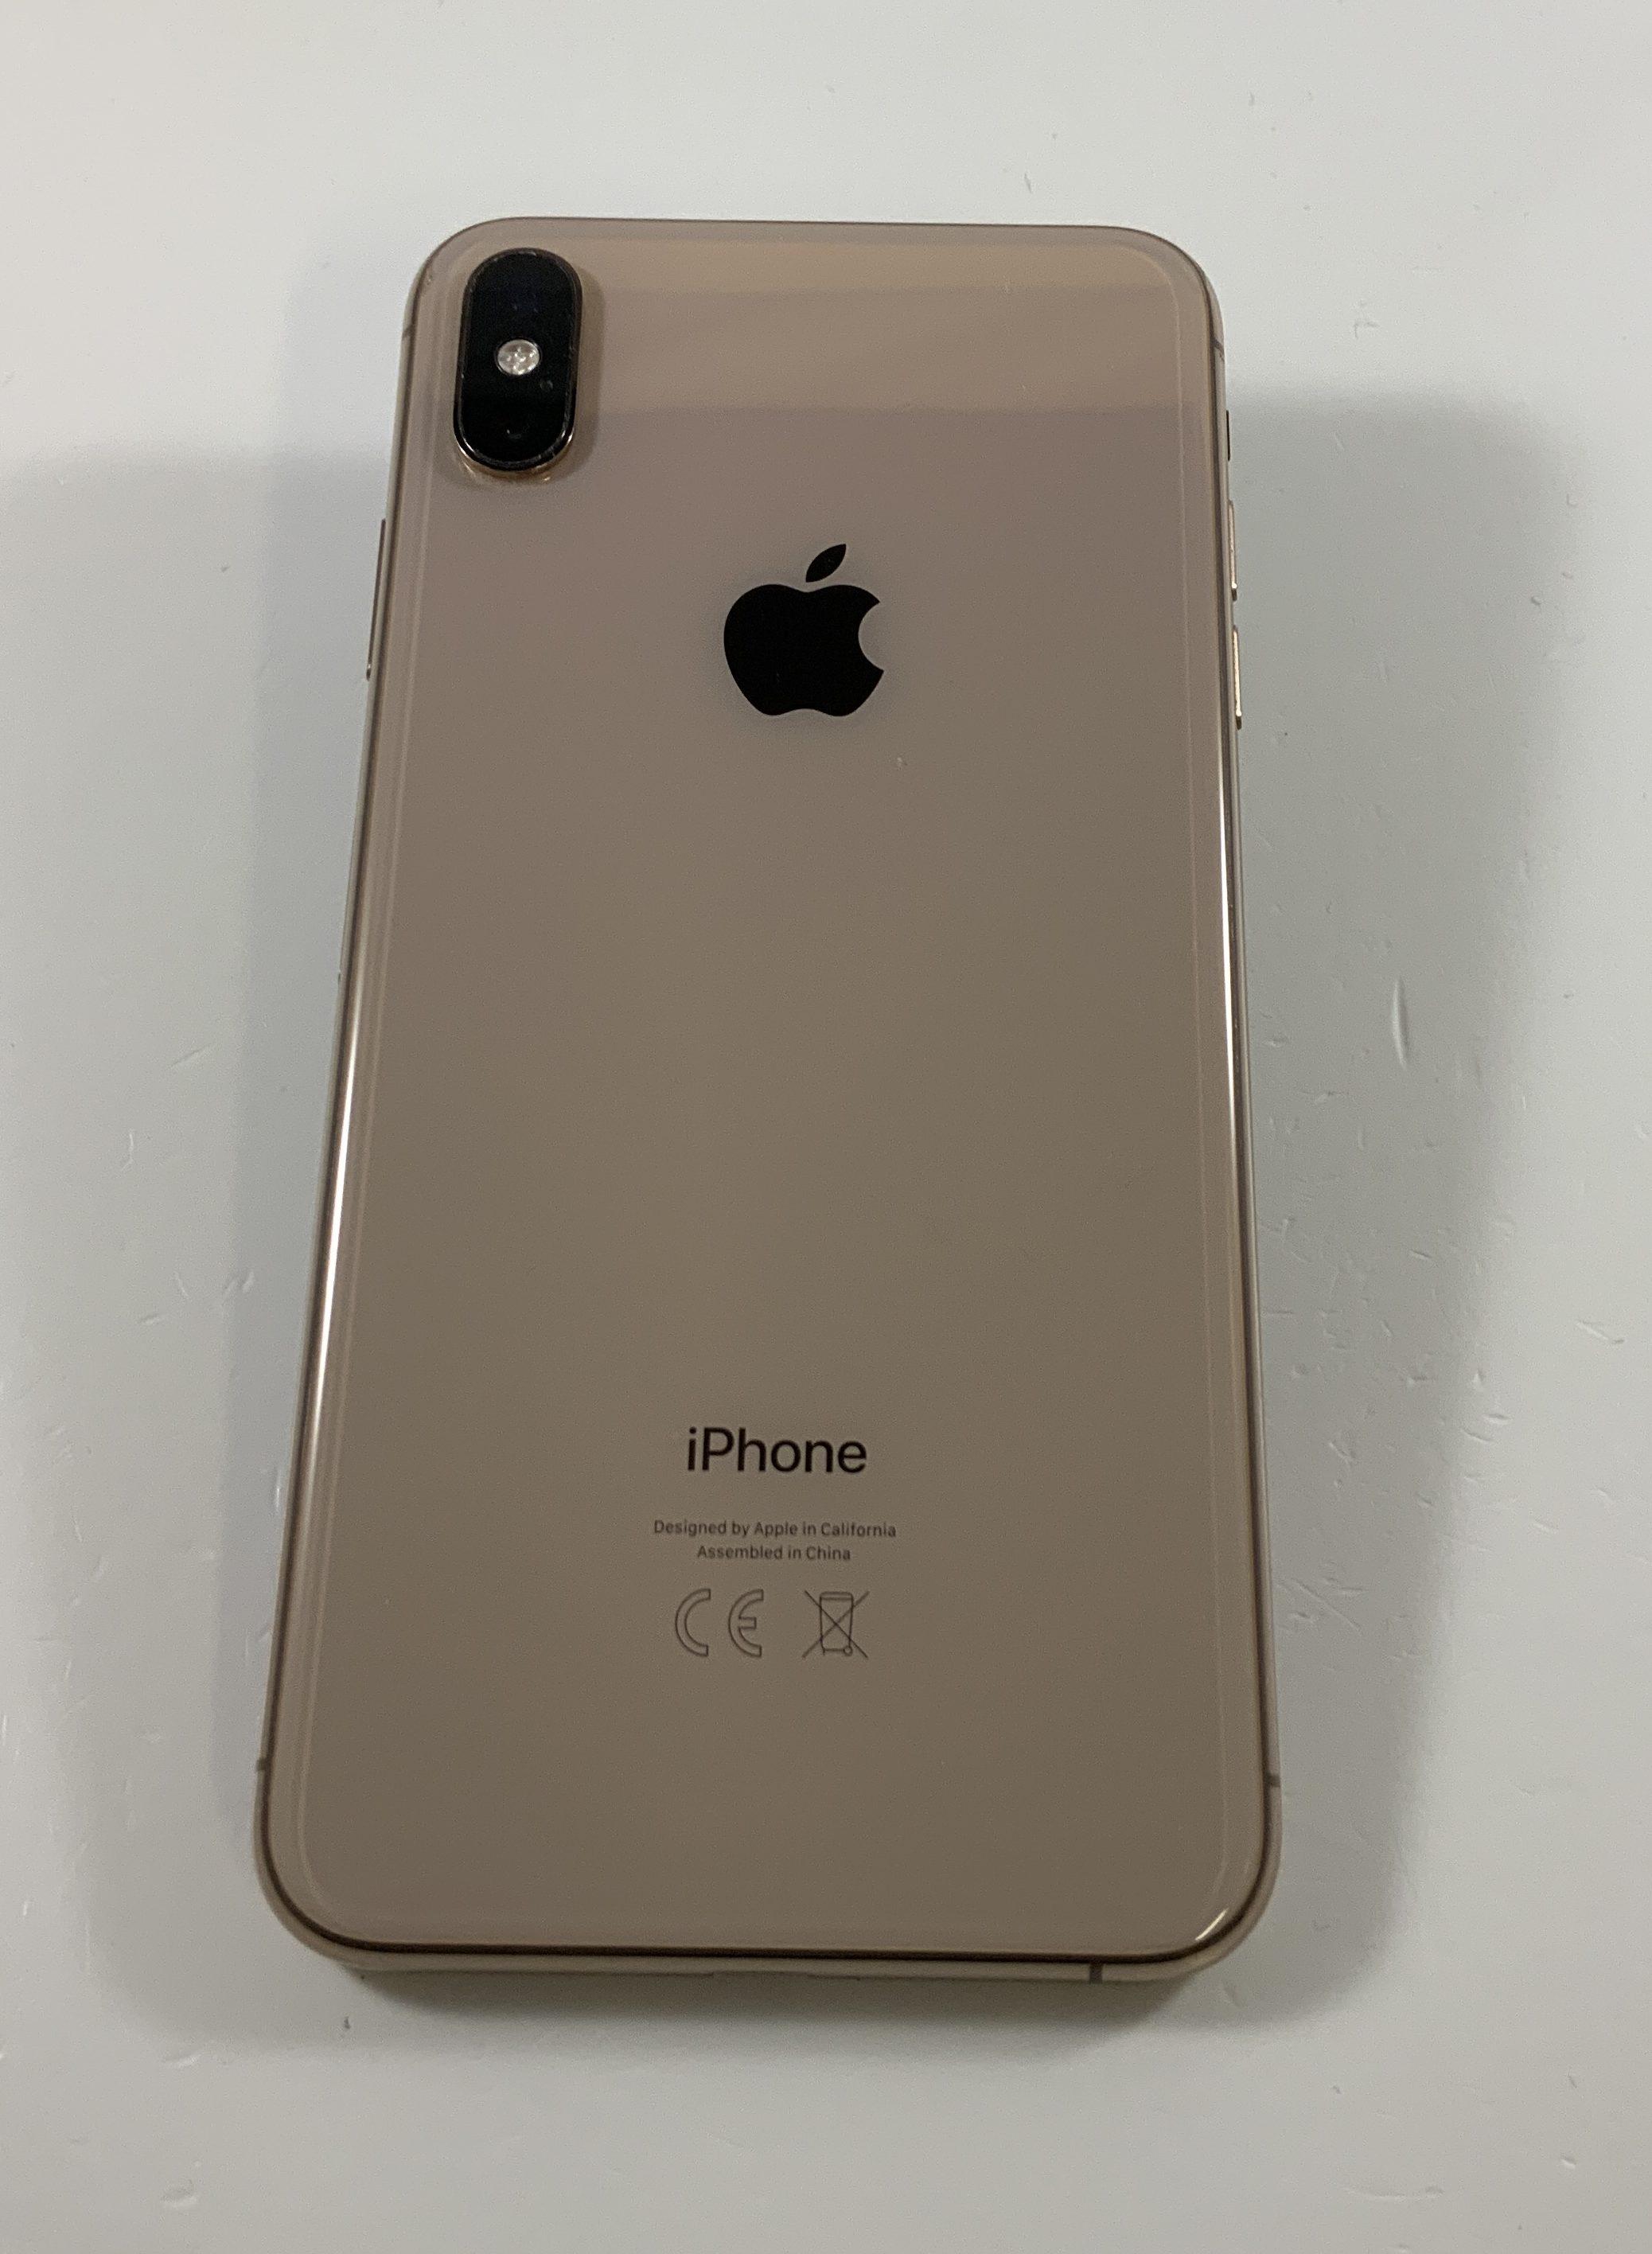 iPhone XS Max 64GB, 64GB, Gold, image 2